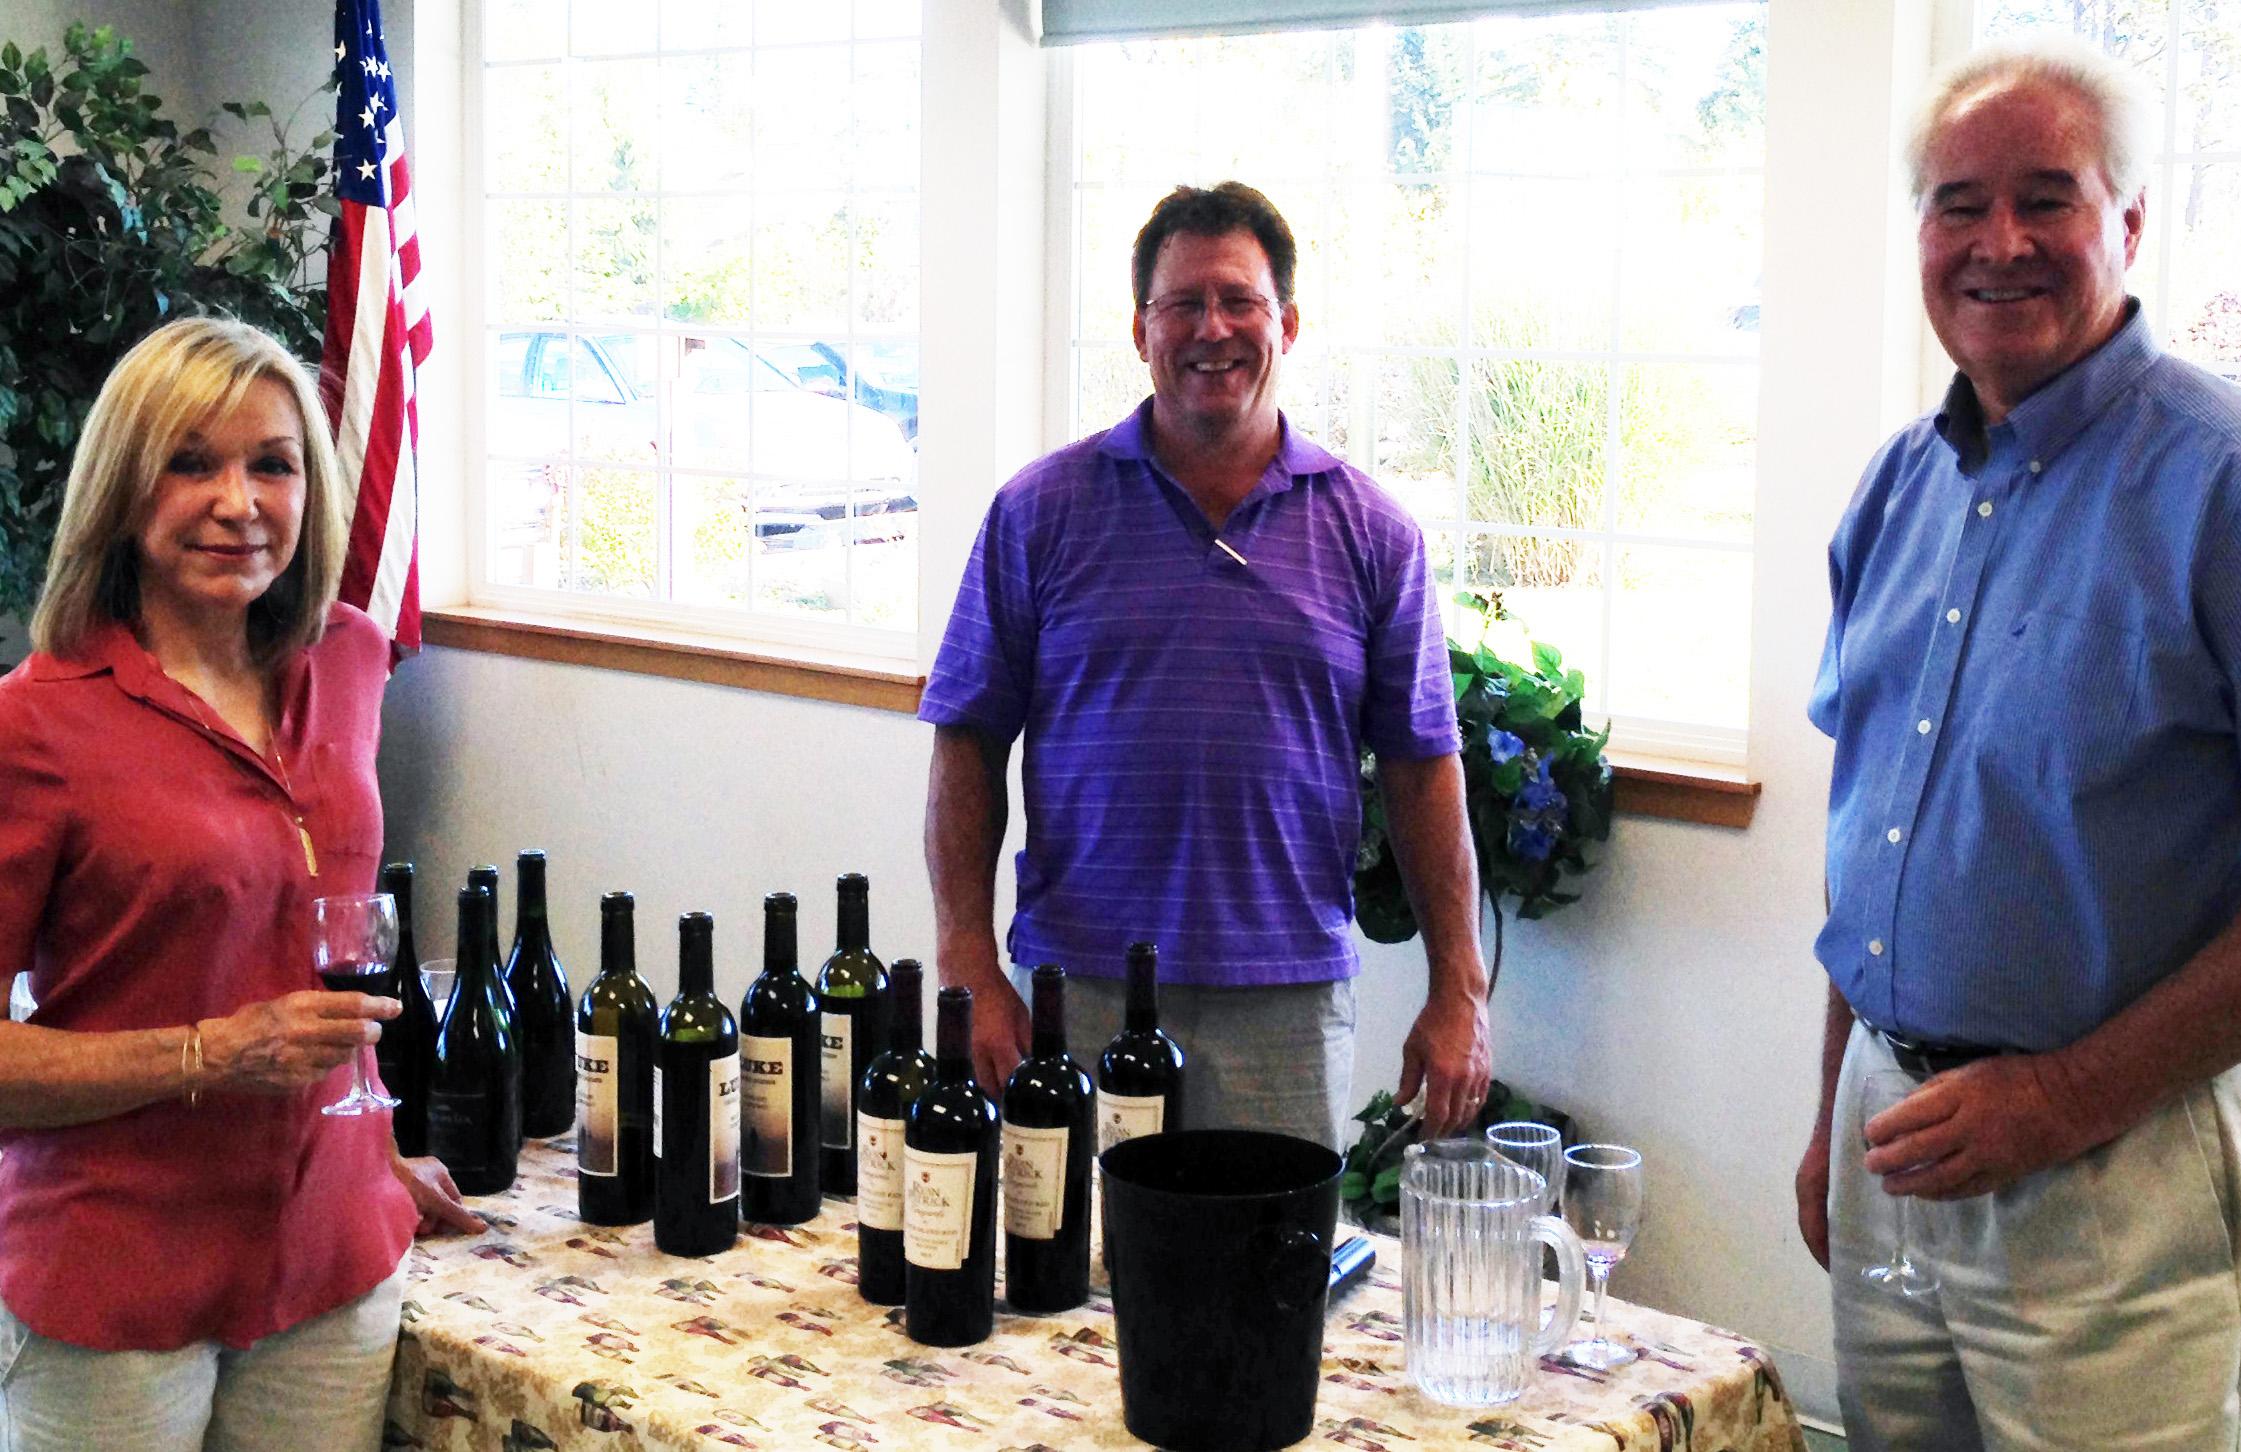 Wine Tasting - Photo courtesy Mullis Community Senior Center